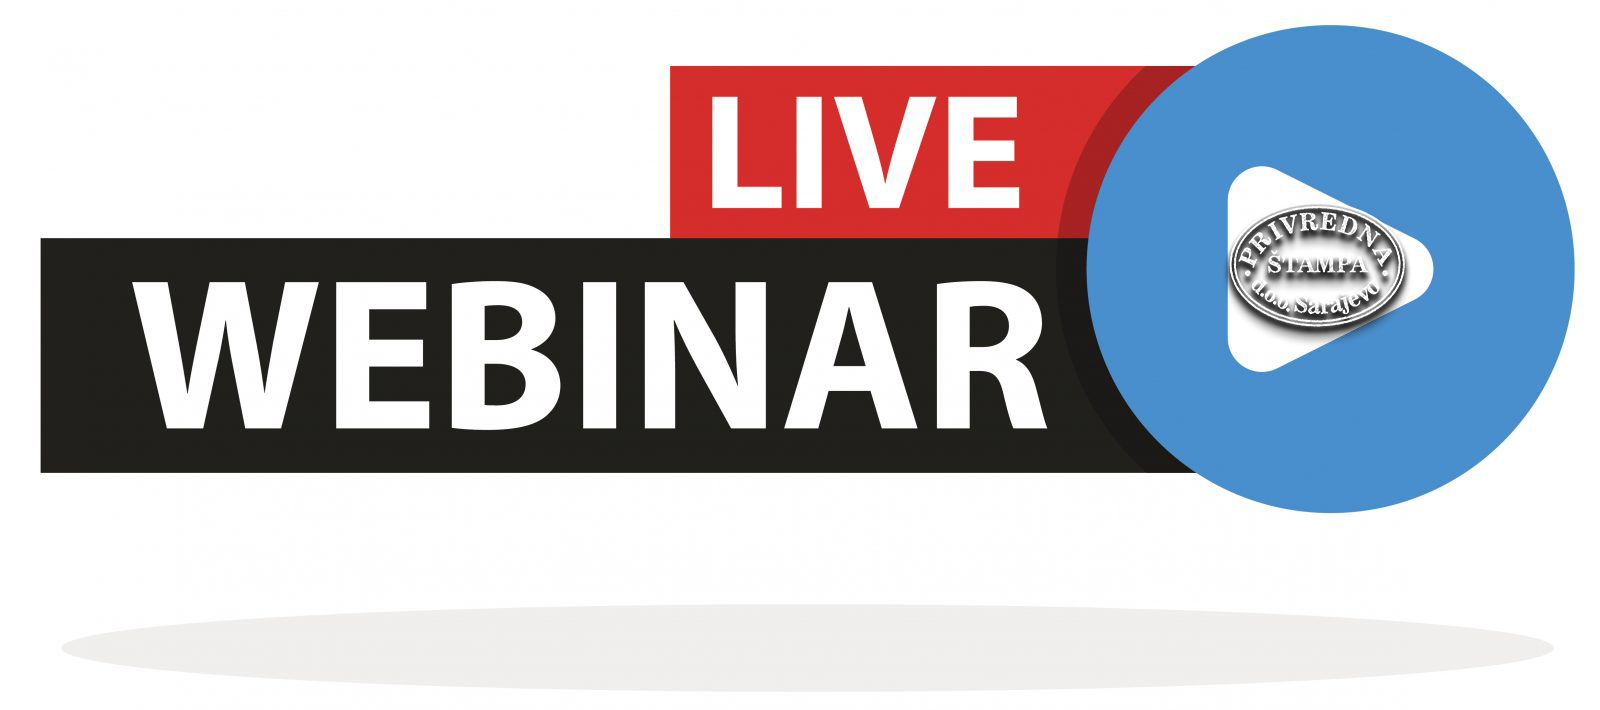 Live Webinar Fb